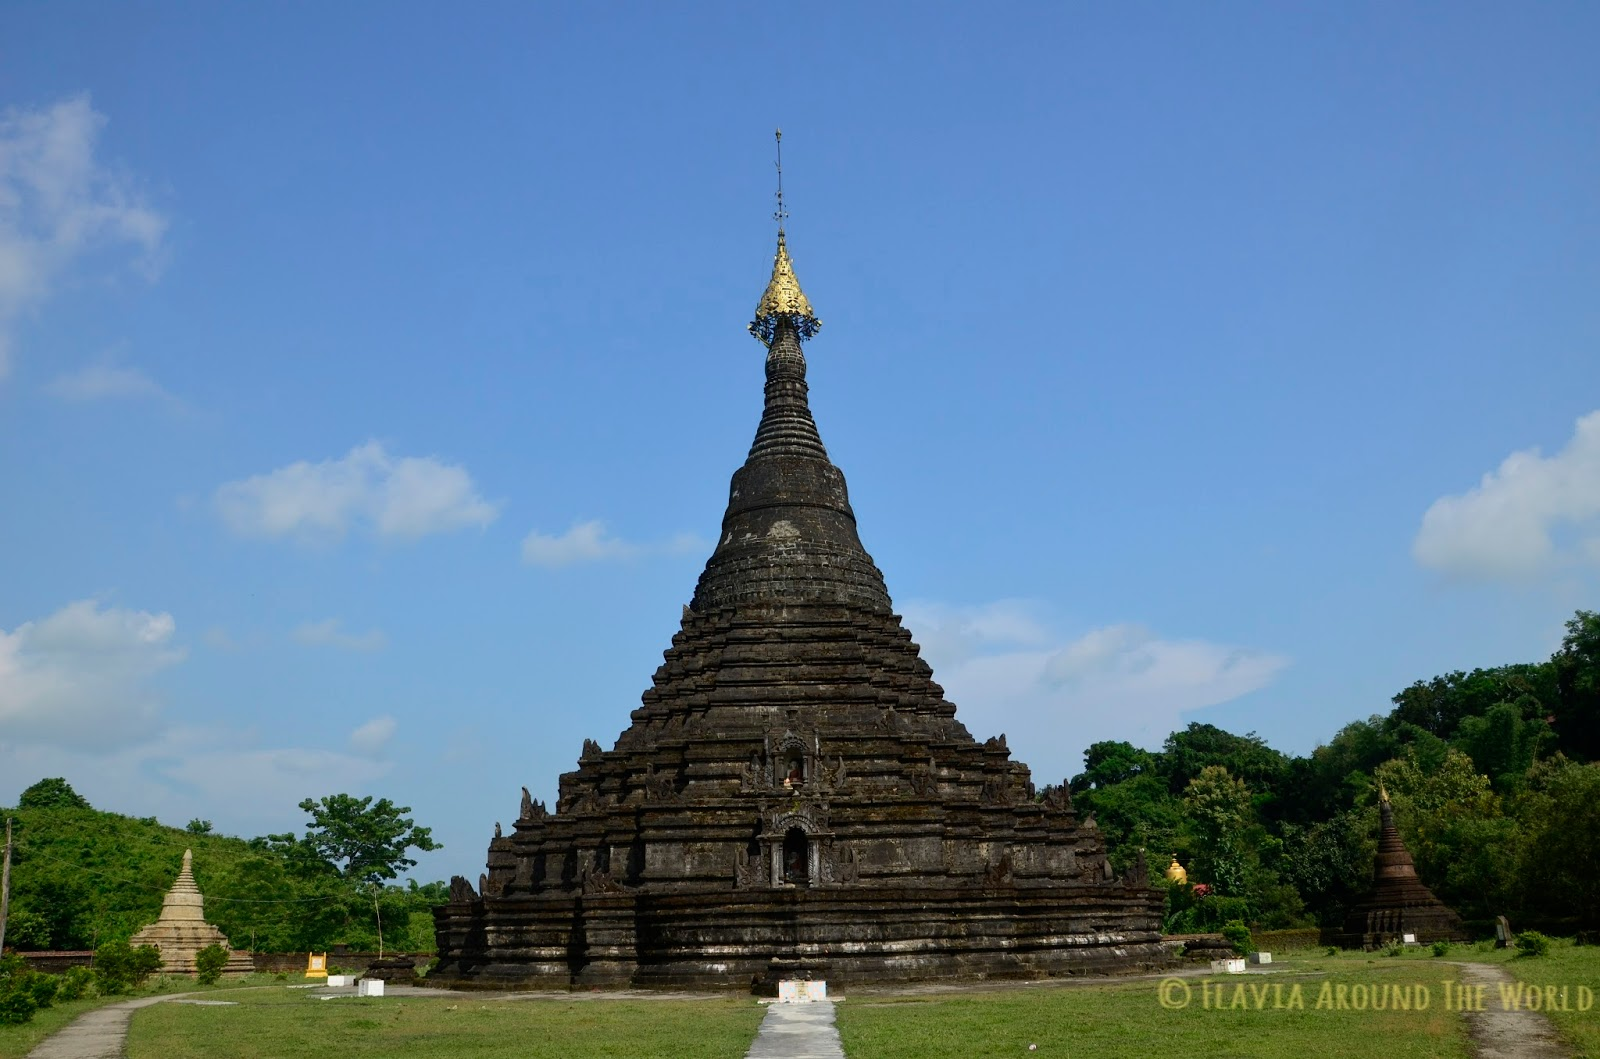 Sakyamanaung, Mrauk U, Myanmar